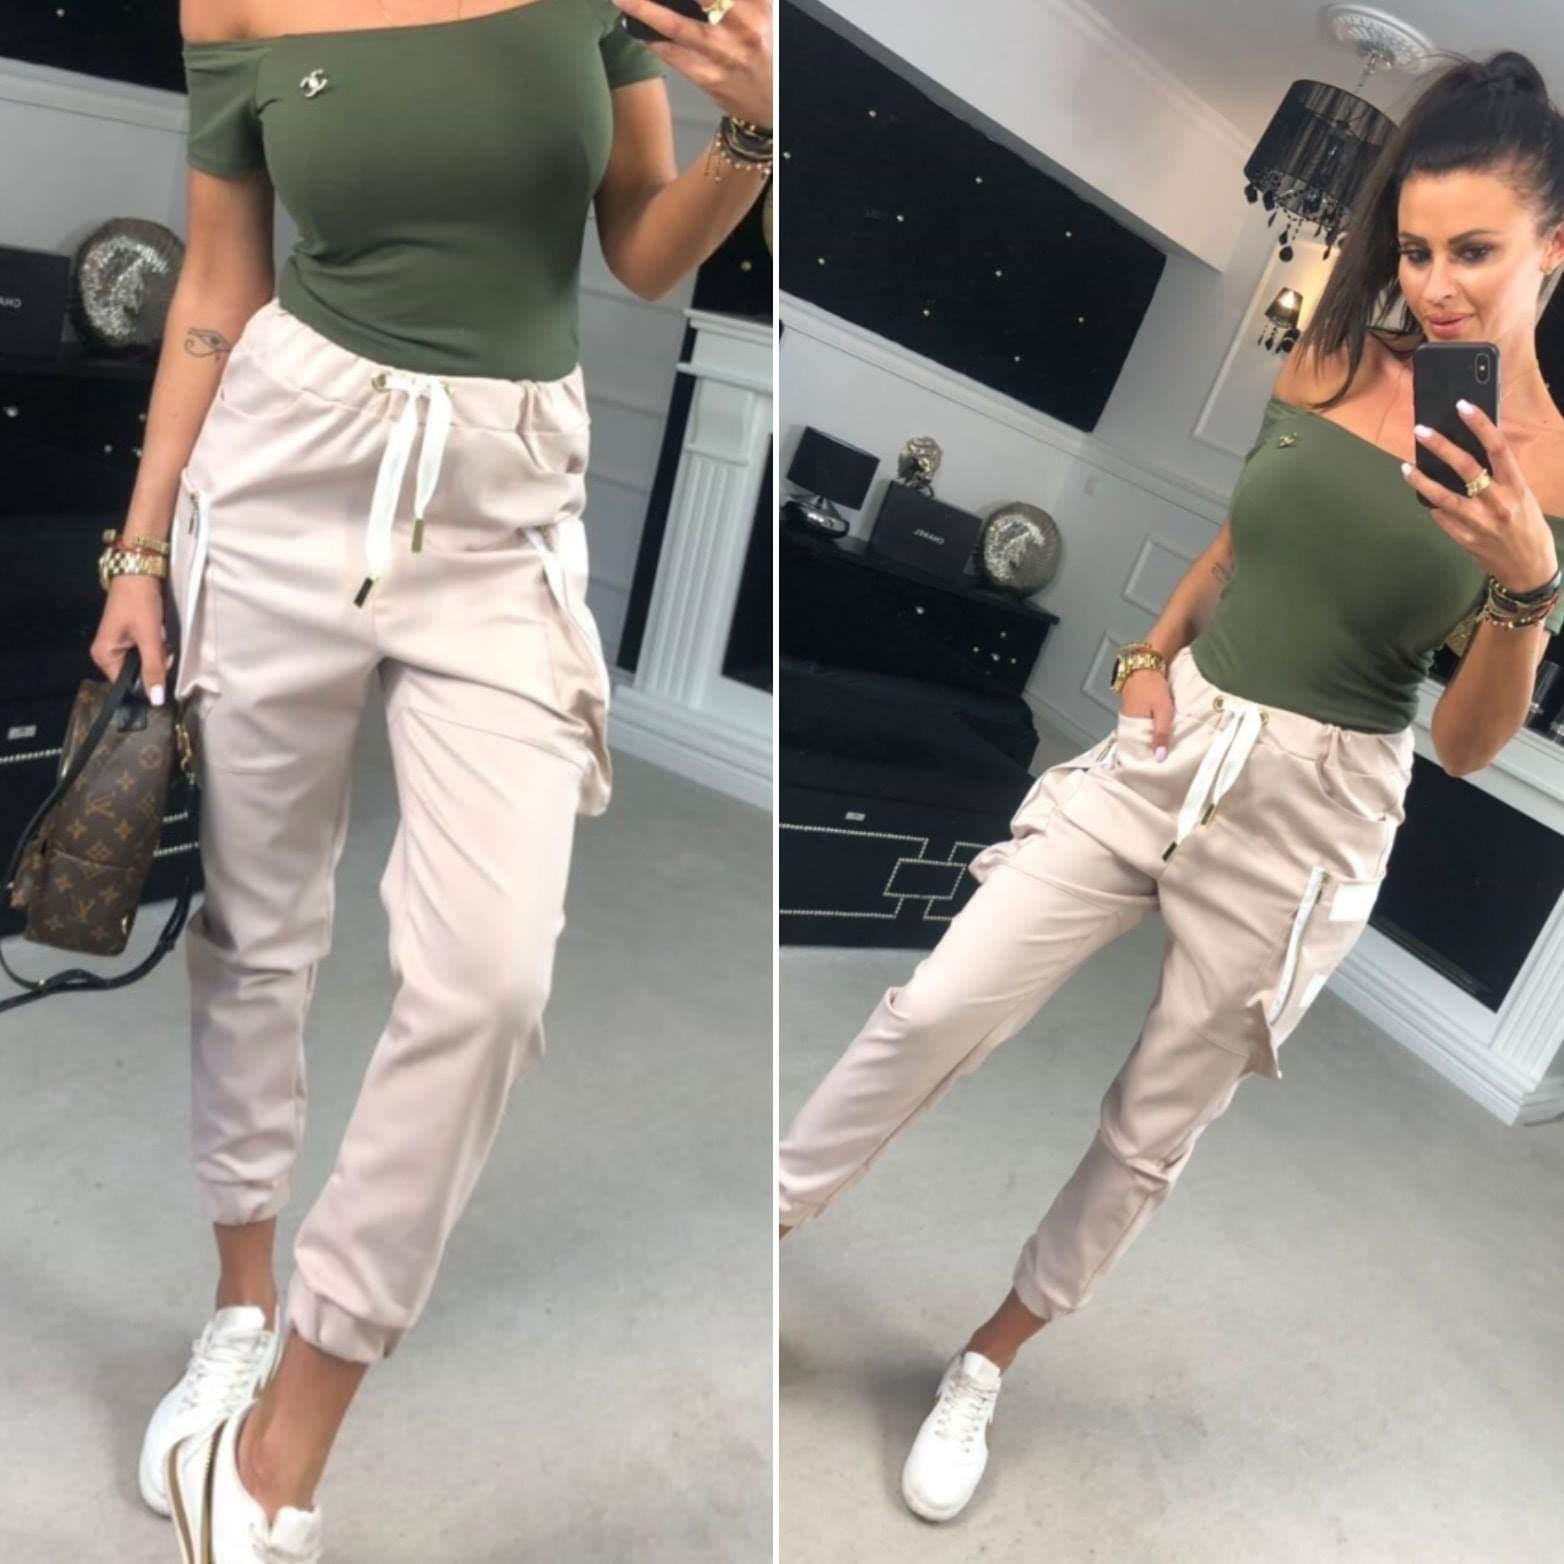 Štýlové dámske kapsačové nohavice (Štýlové dámske kapsačové nohavice)